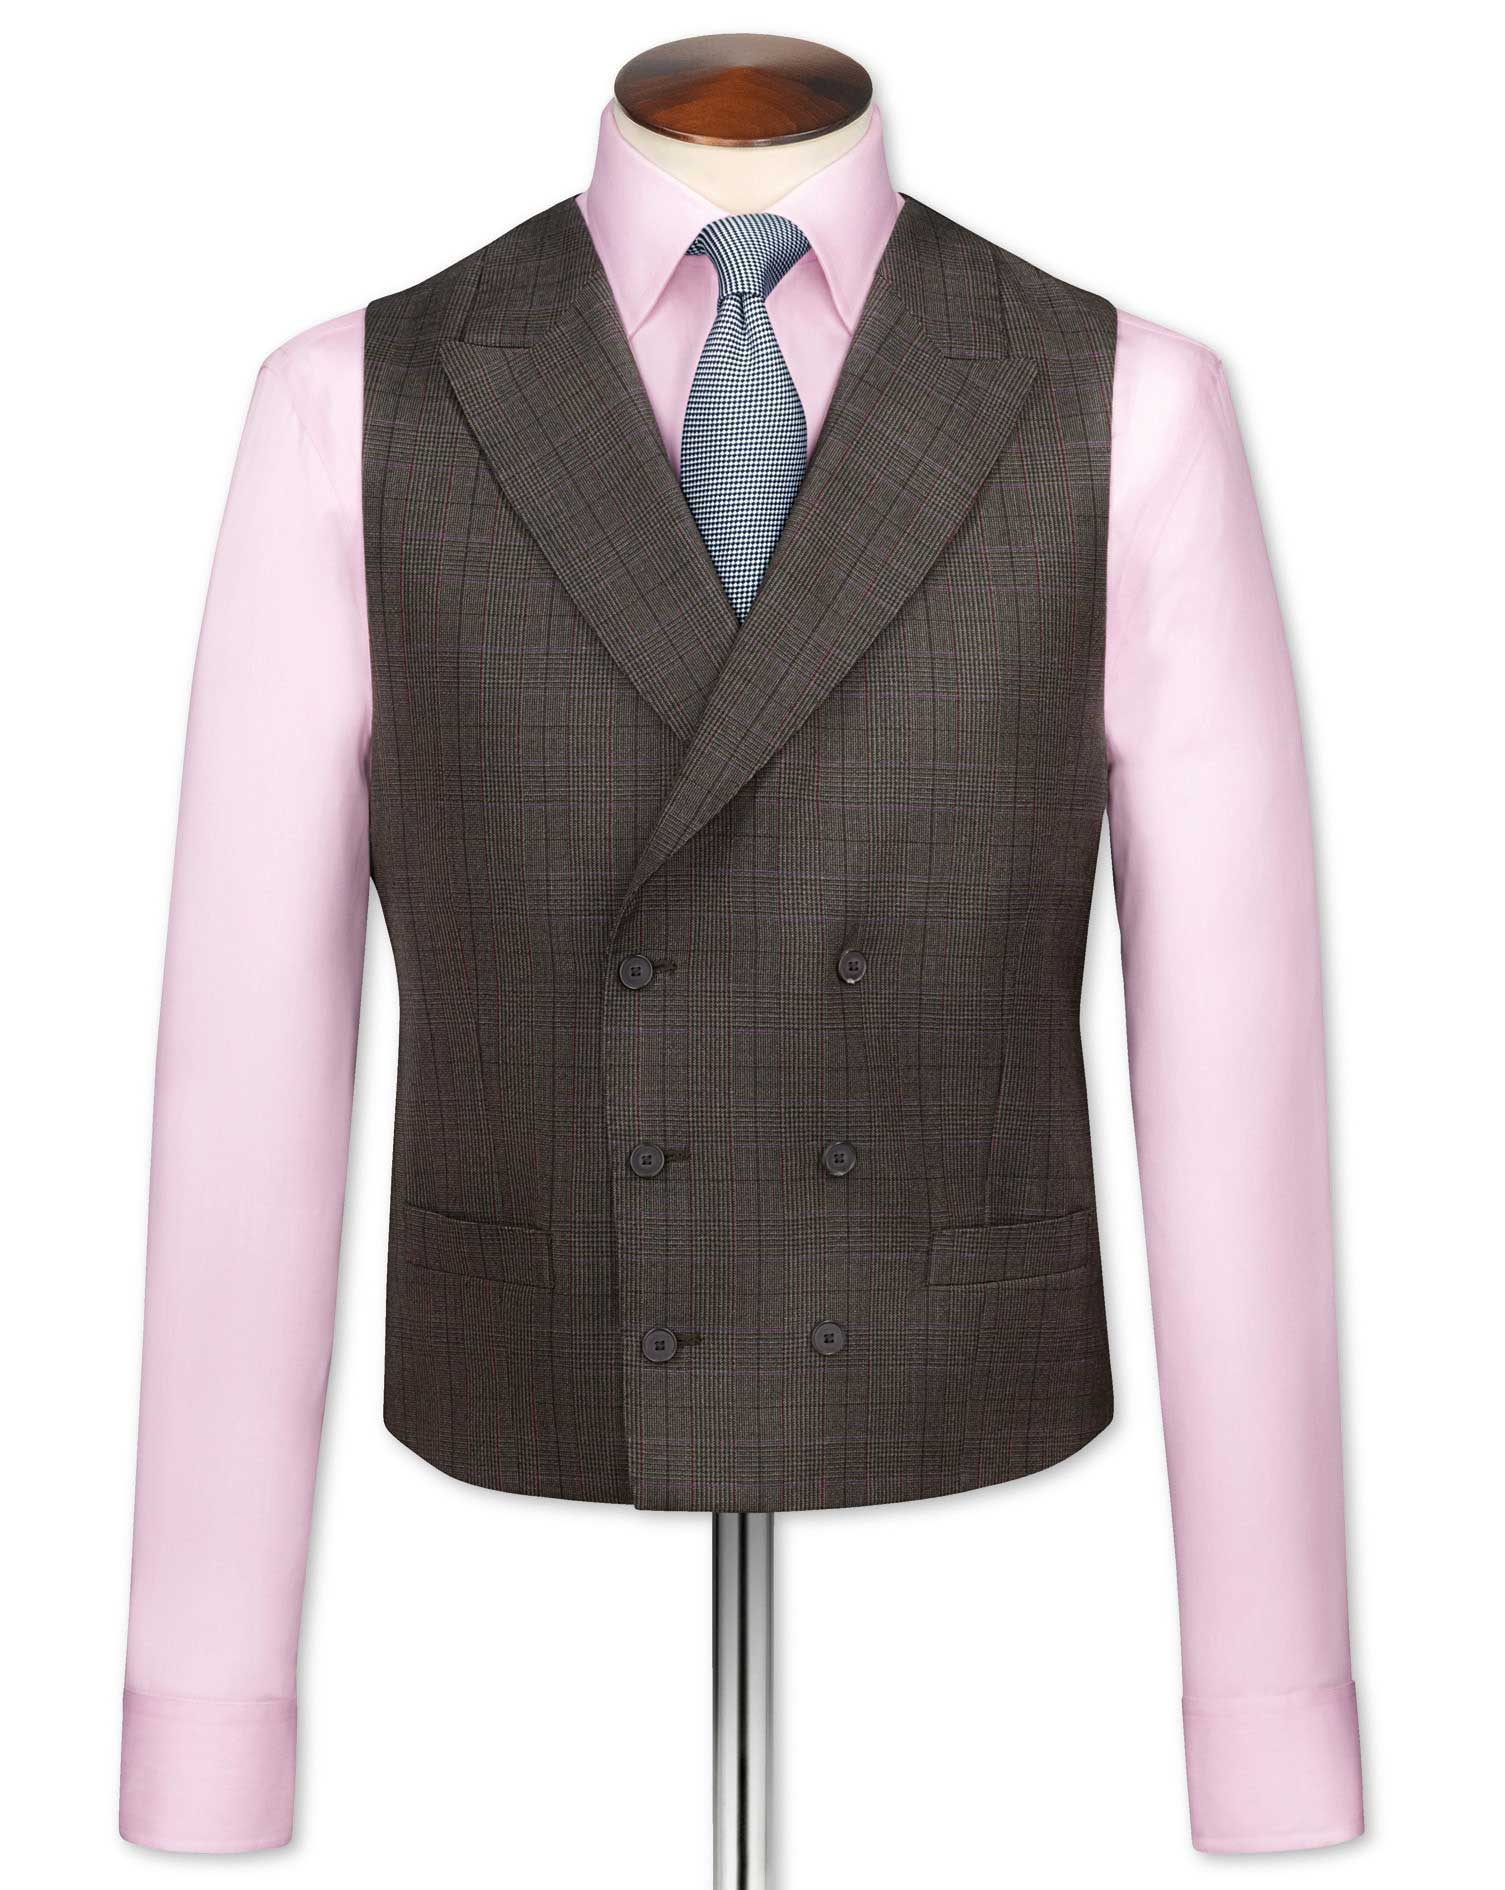 Brown Check British Panama Luxury Suit Wool Waistcoat Size w36 by Charles Tyrwhitt